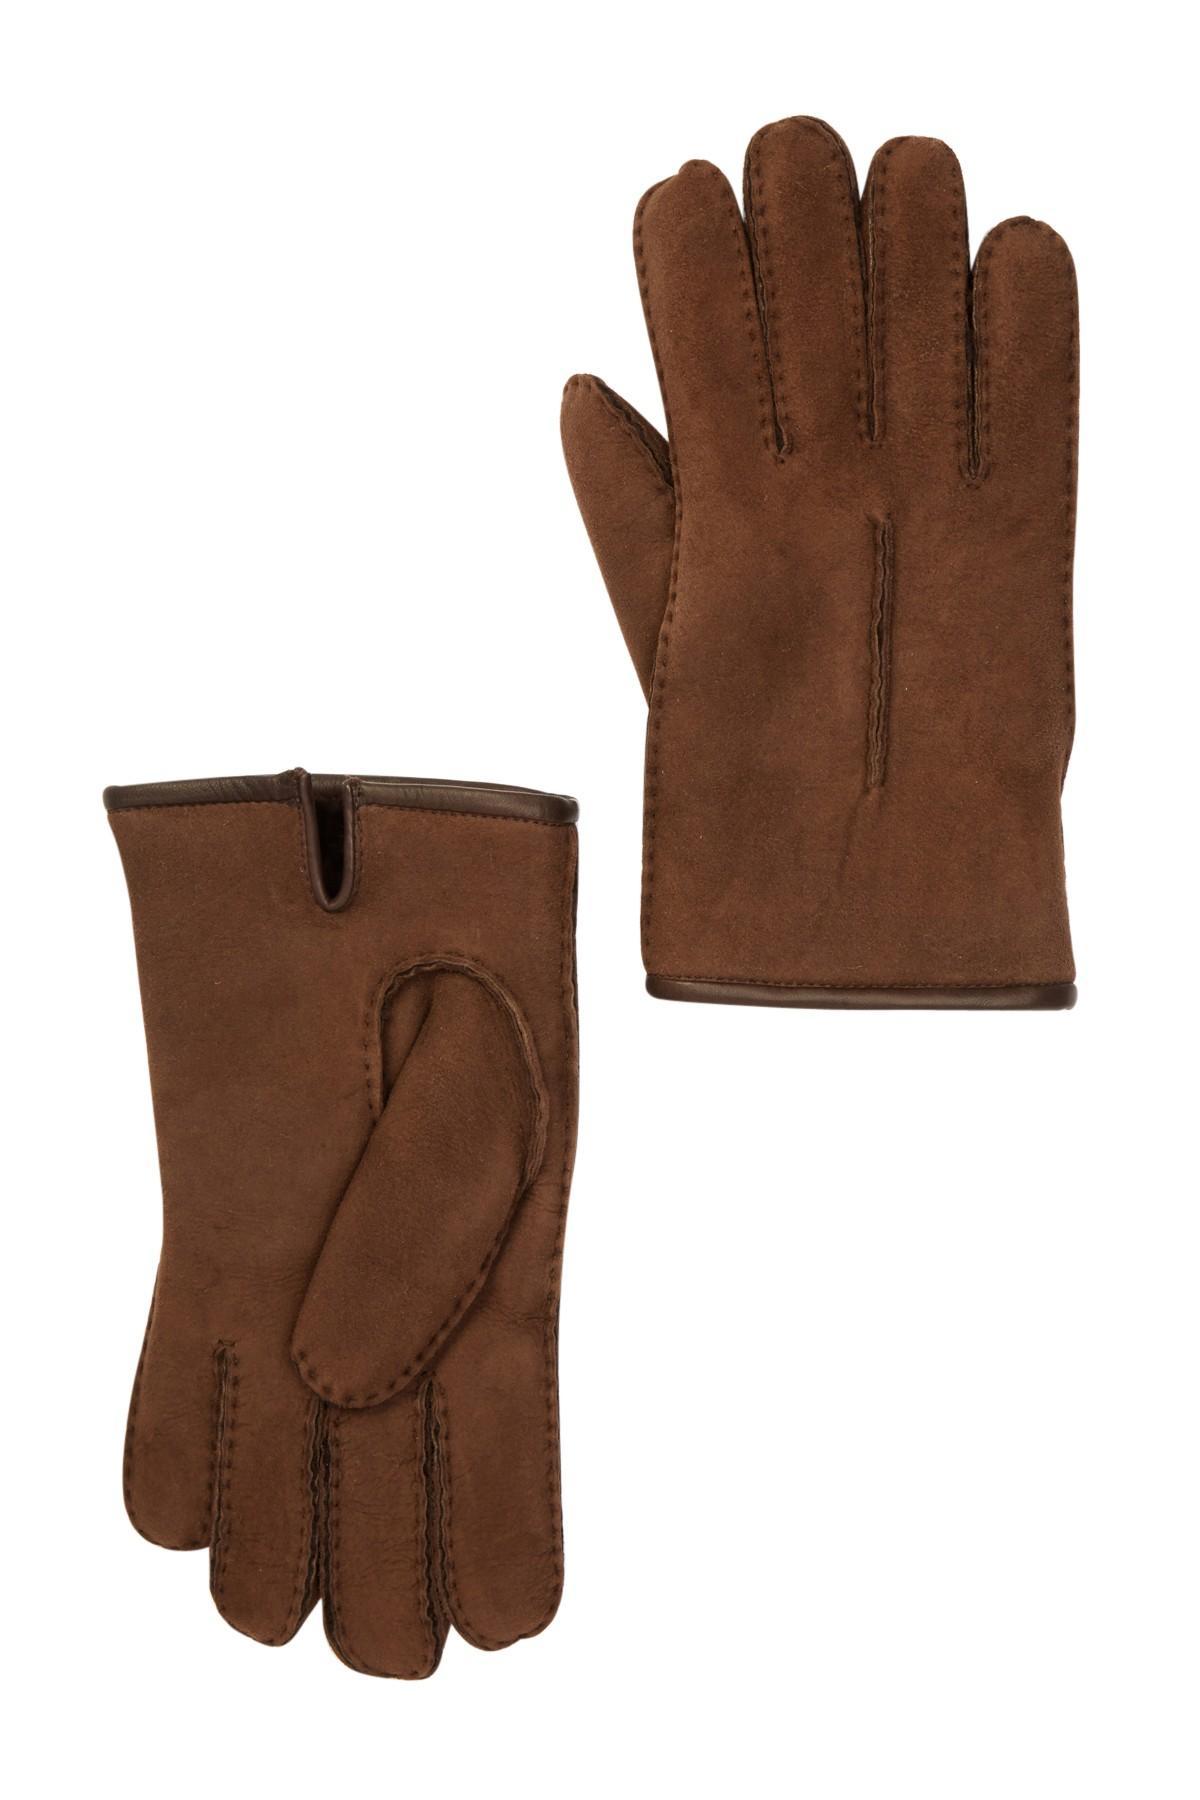 f7d2453aac0 Ugg Leather Sheepskin Gloves - cheap watches mgc-gas.com